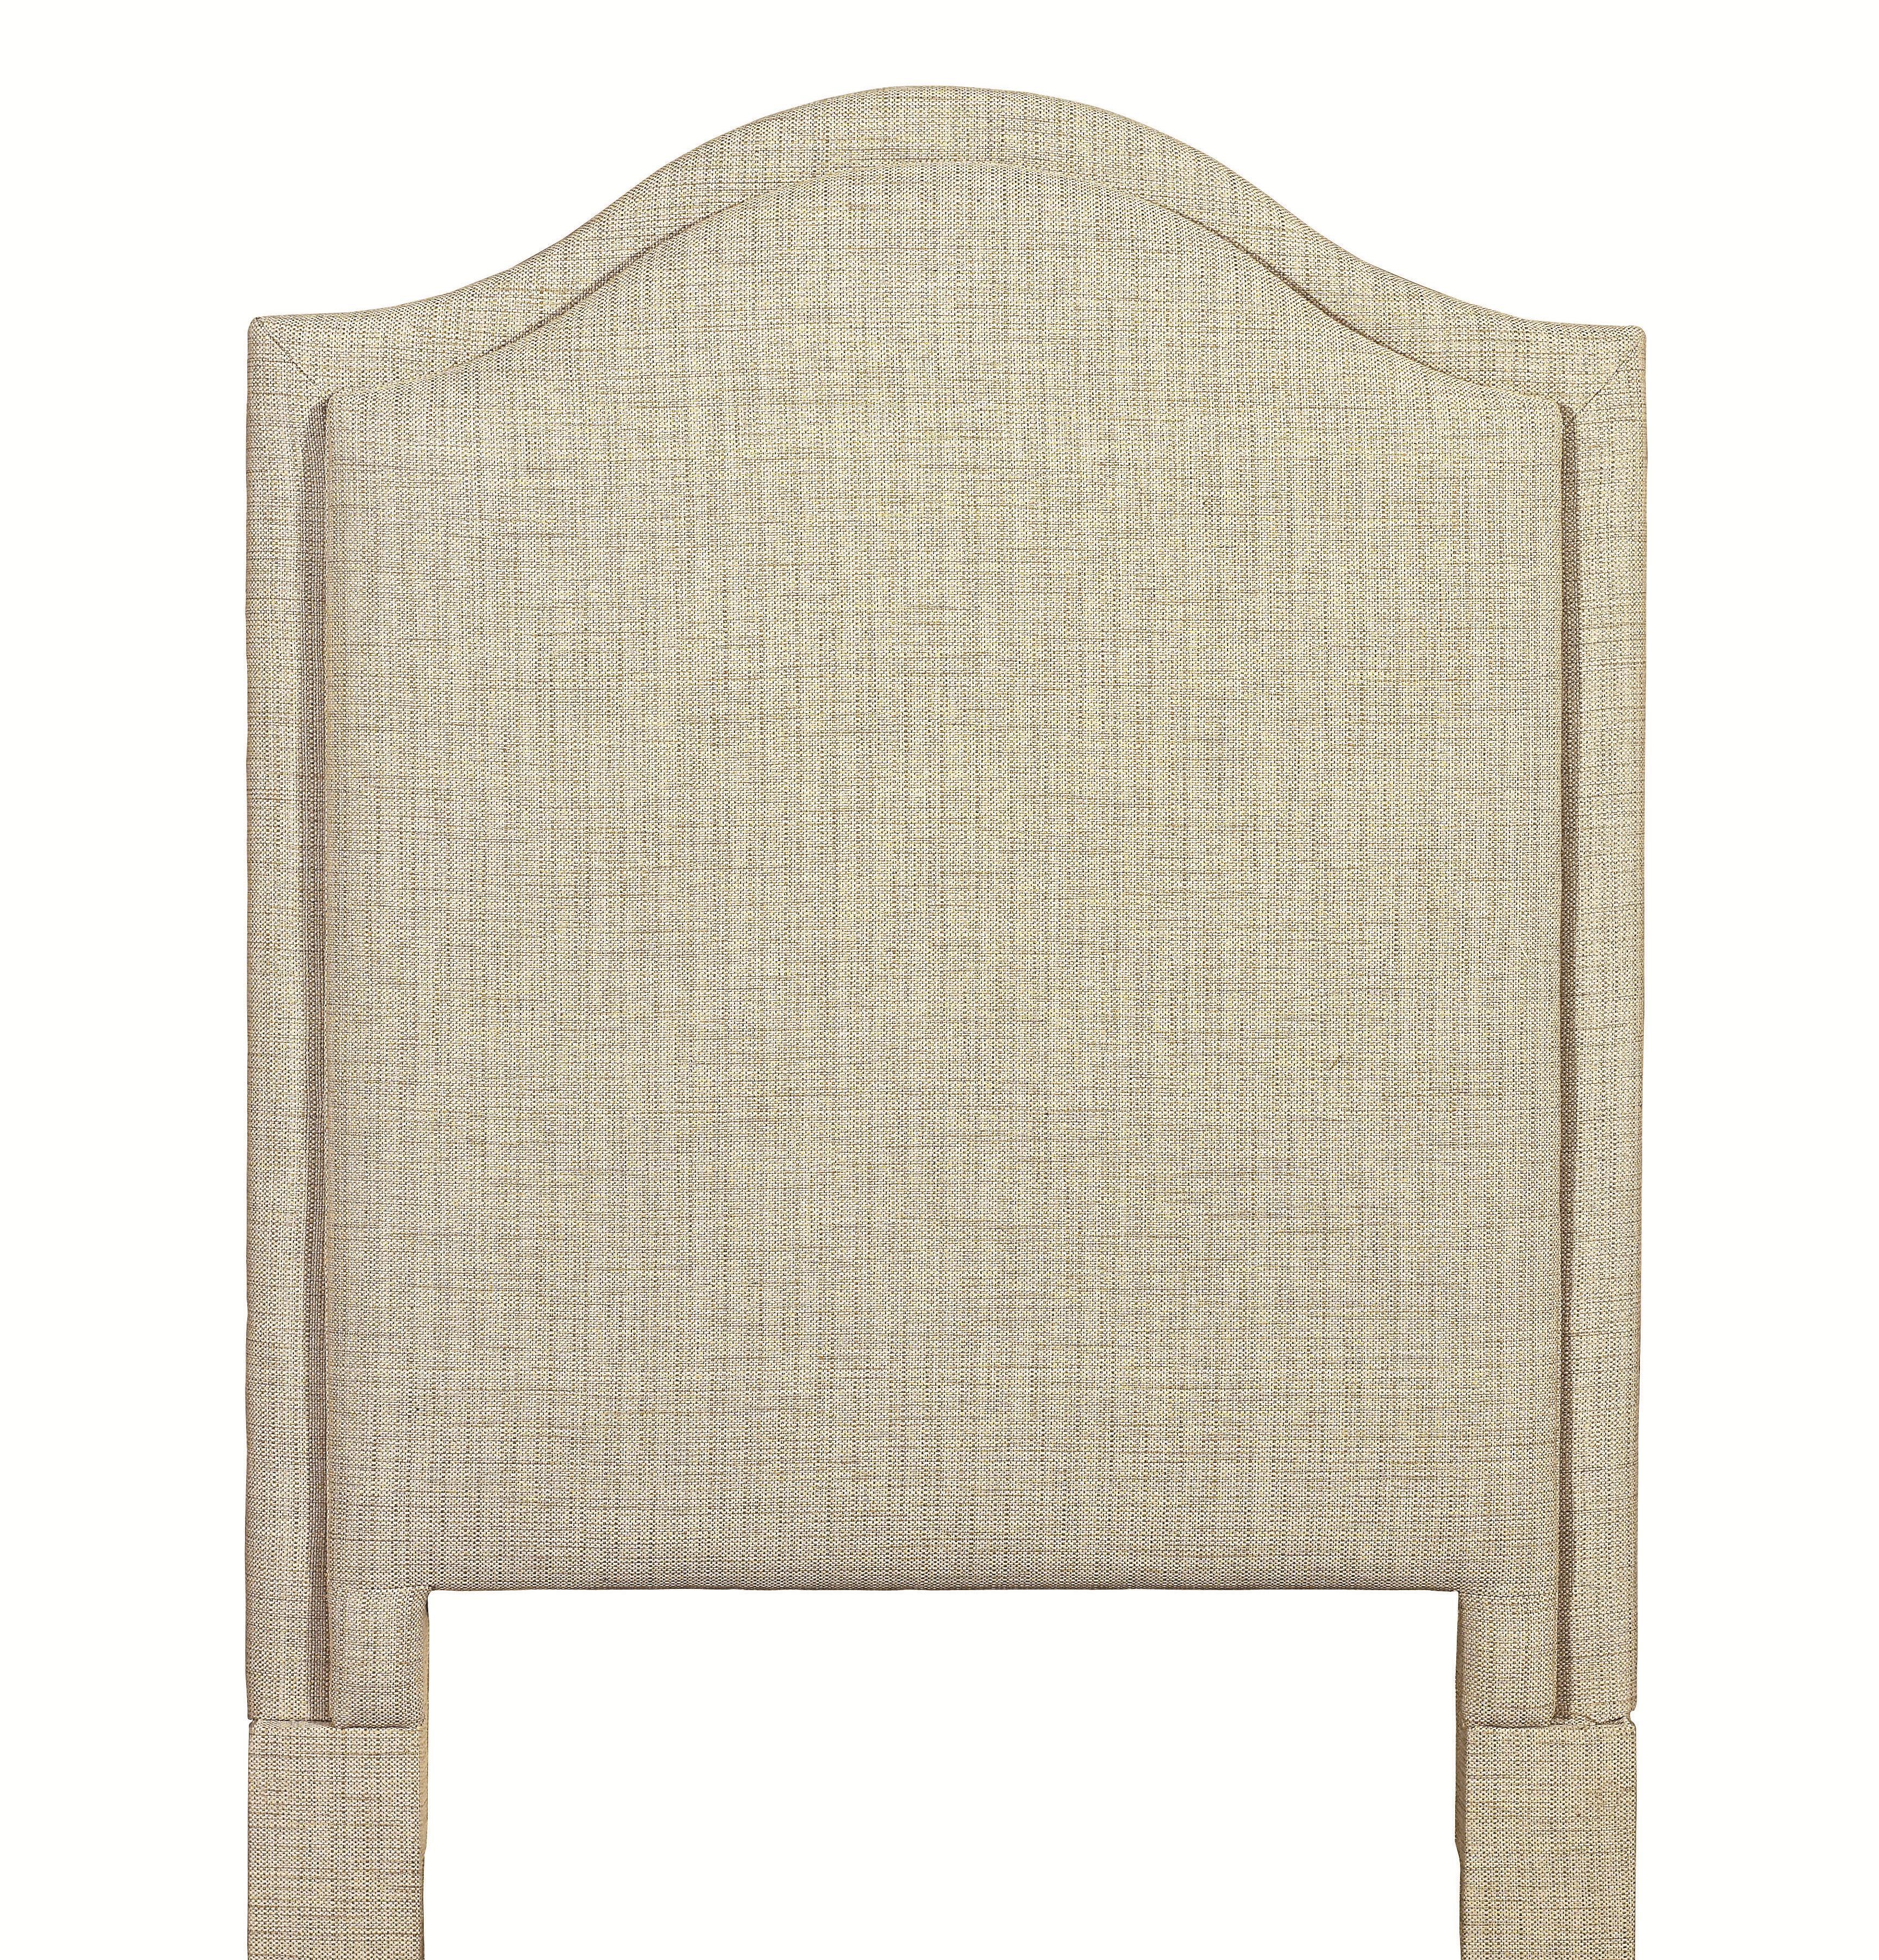 Custom Upholstered Beds Twin Vienna Upholstered Headboard by Bassett at Bassett of Cool Springs